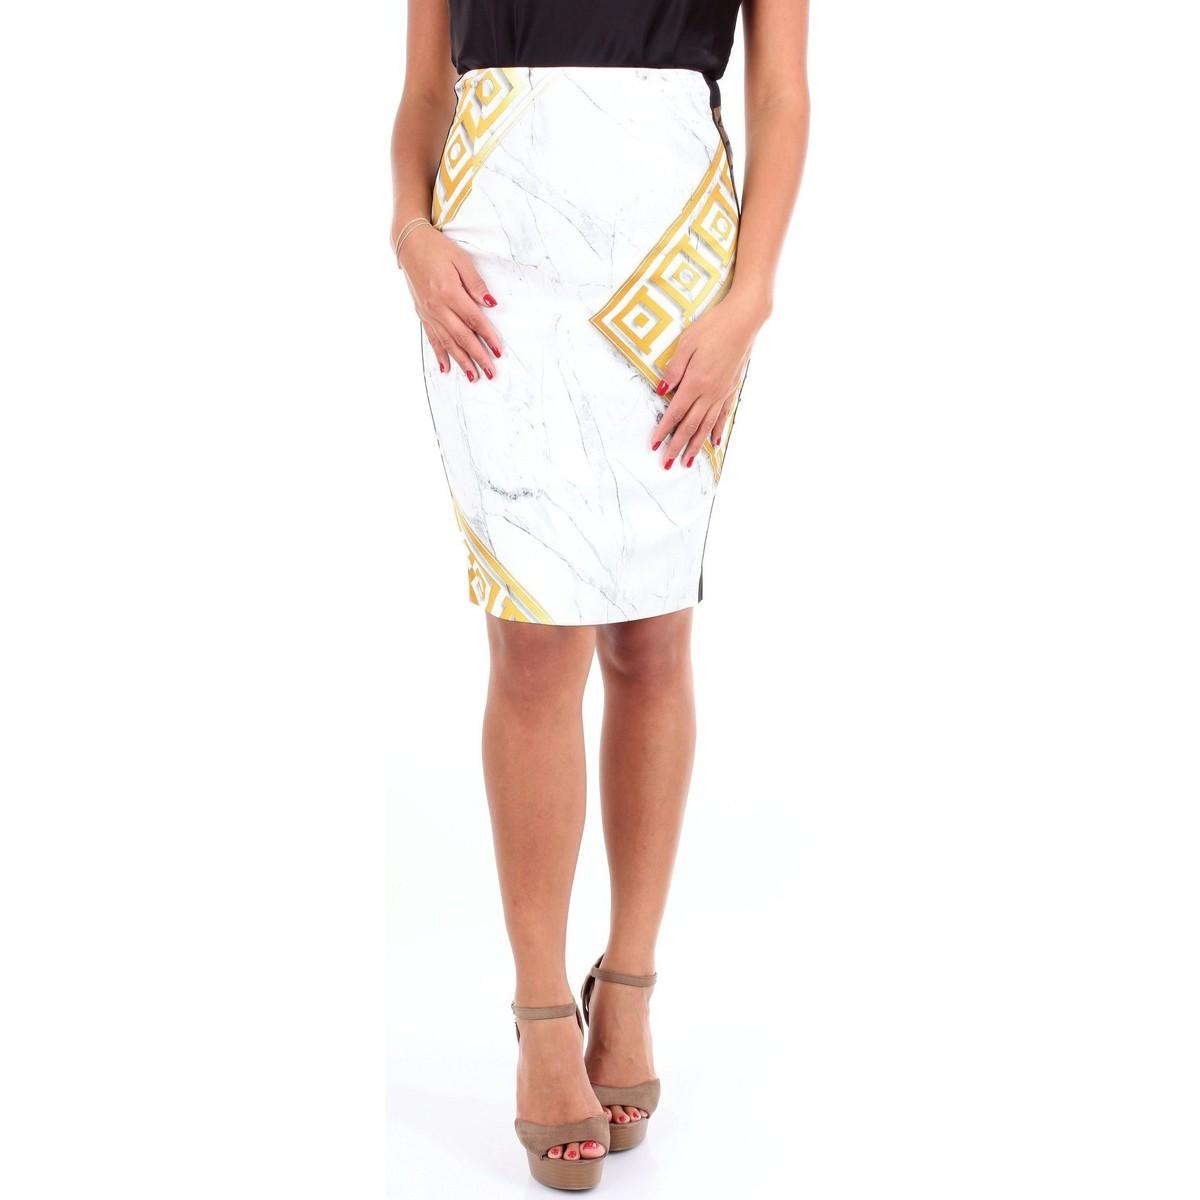 G35955G604544 femmes Jupes en Multicolor Versace en coloris Blanc